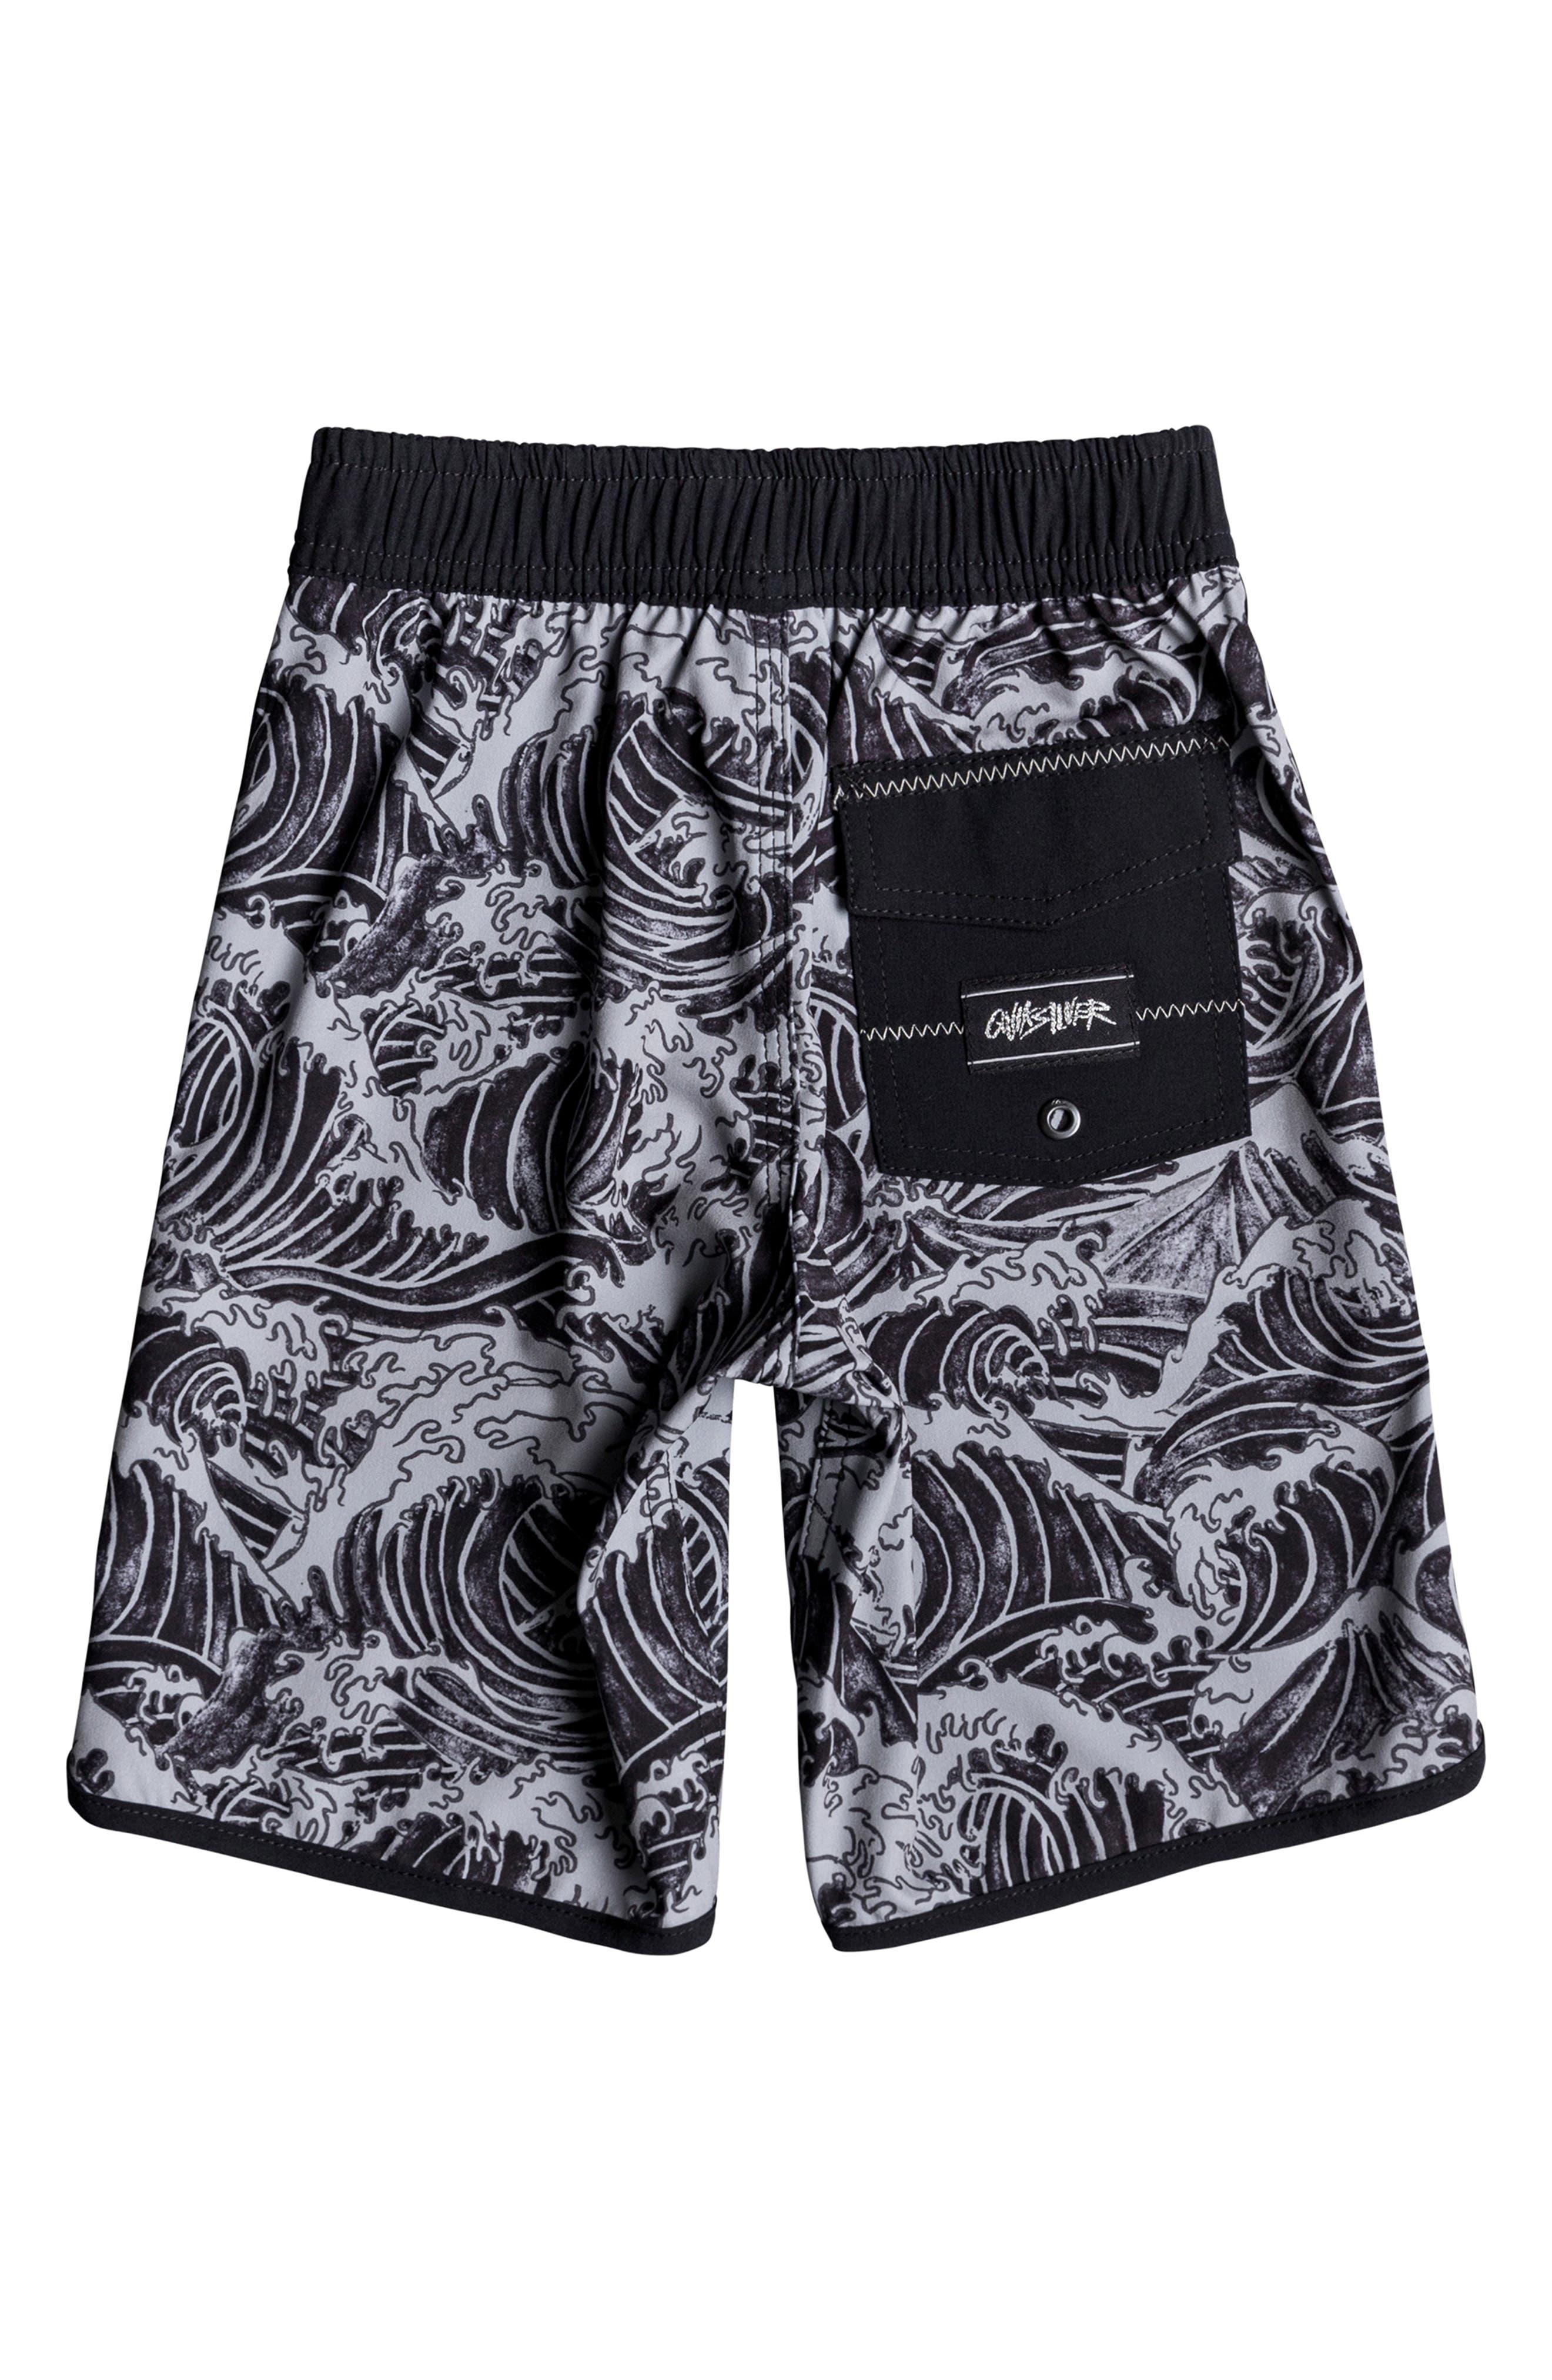 Highline Legend Board Shorts,                             Alternate thumbnail 2, color,                             BLACK